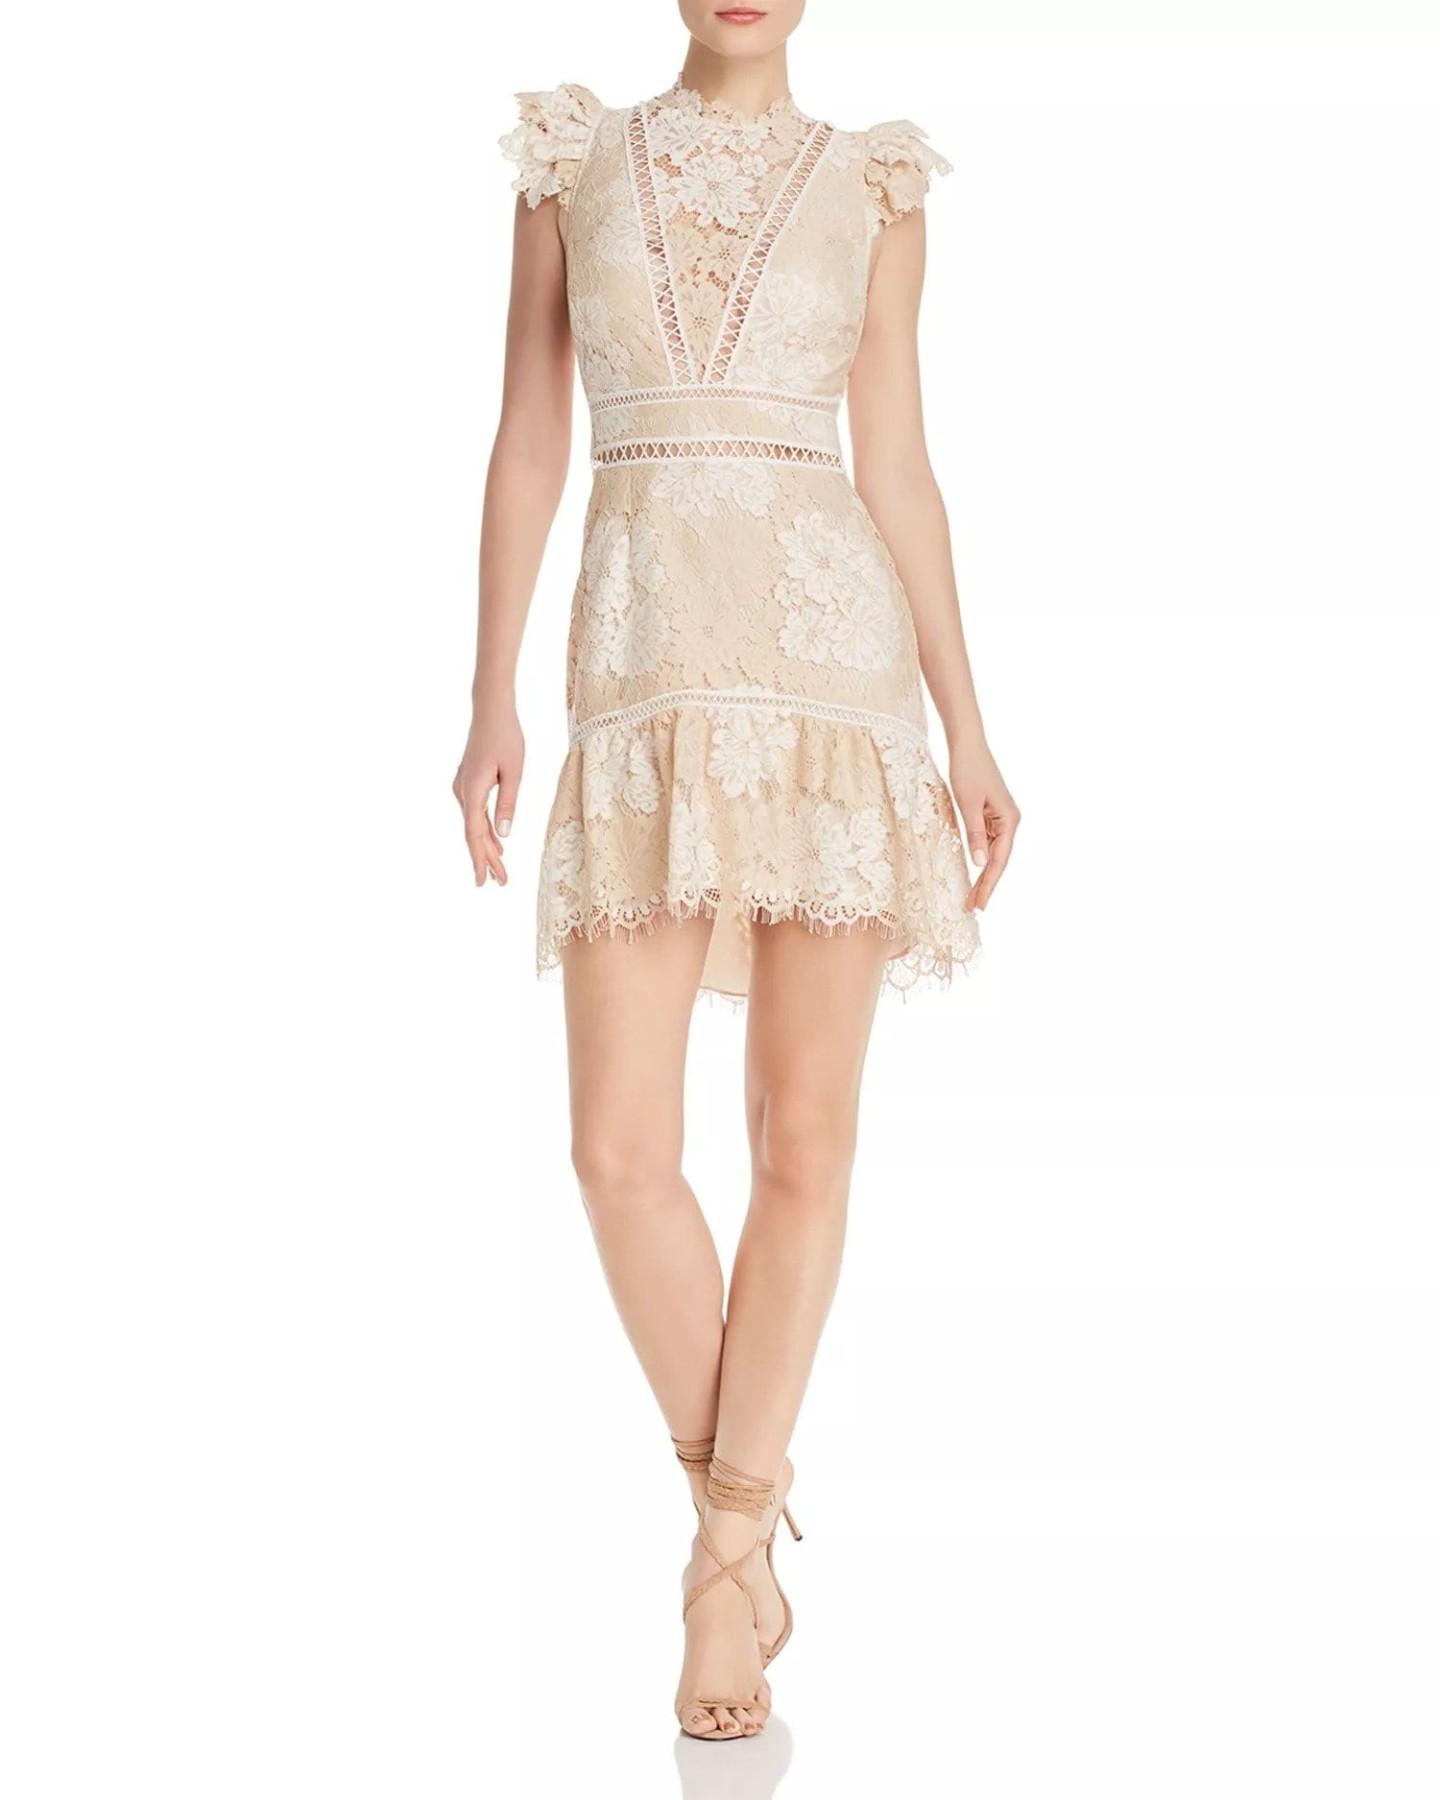 SAYLOR Lace Open-Back Nude Dress